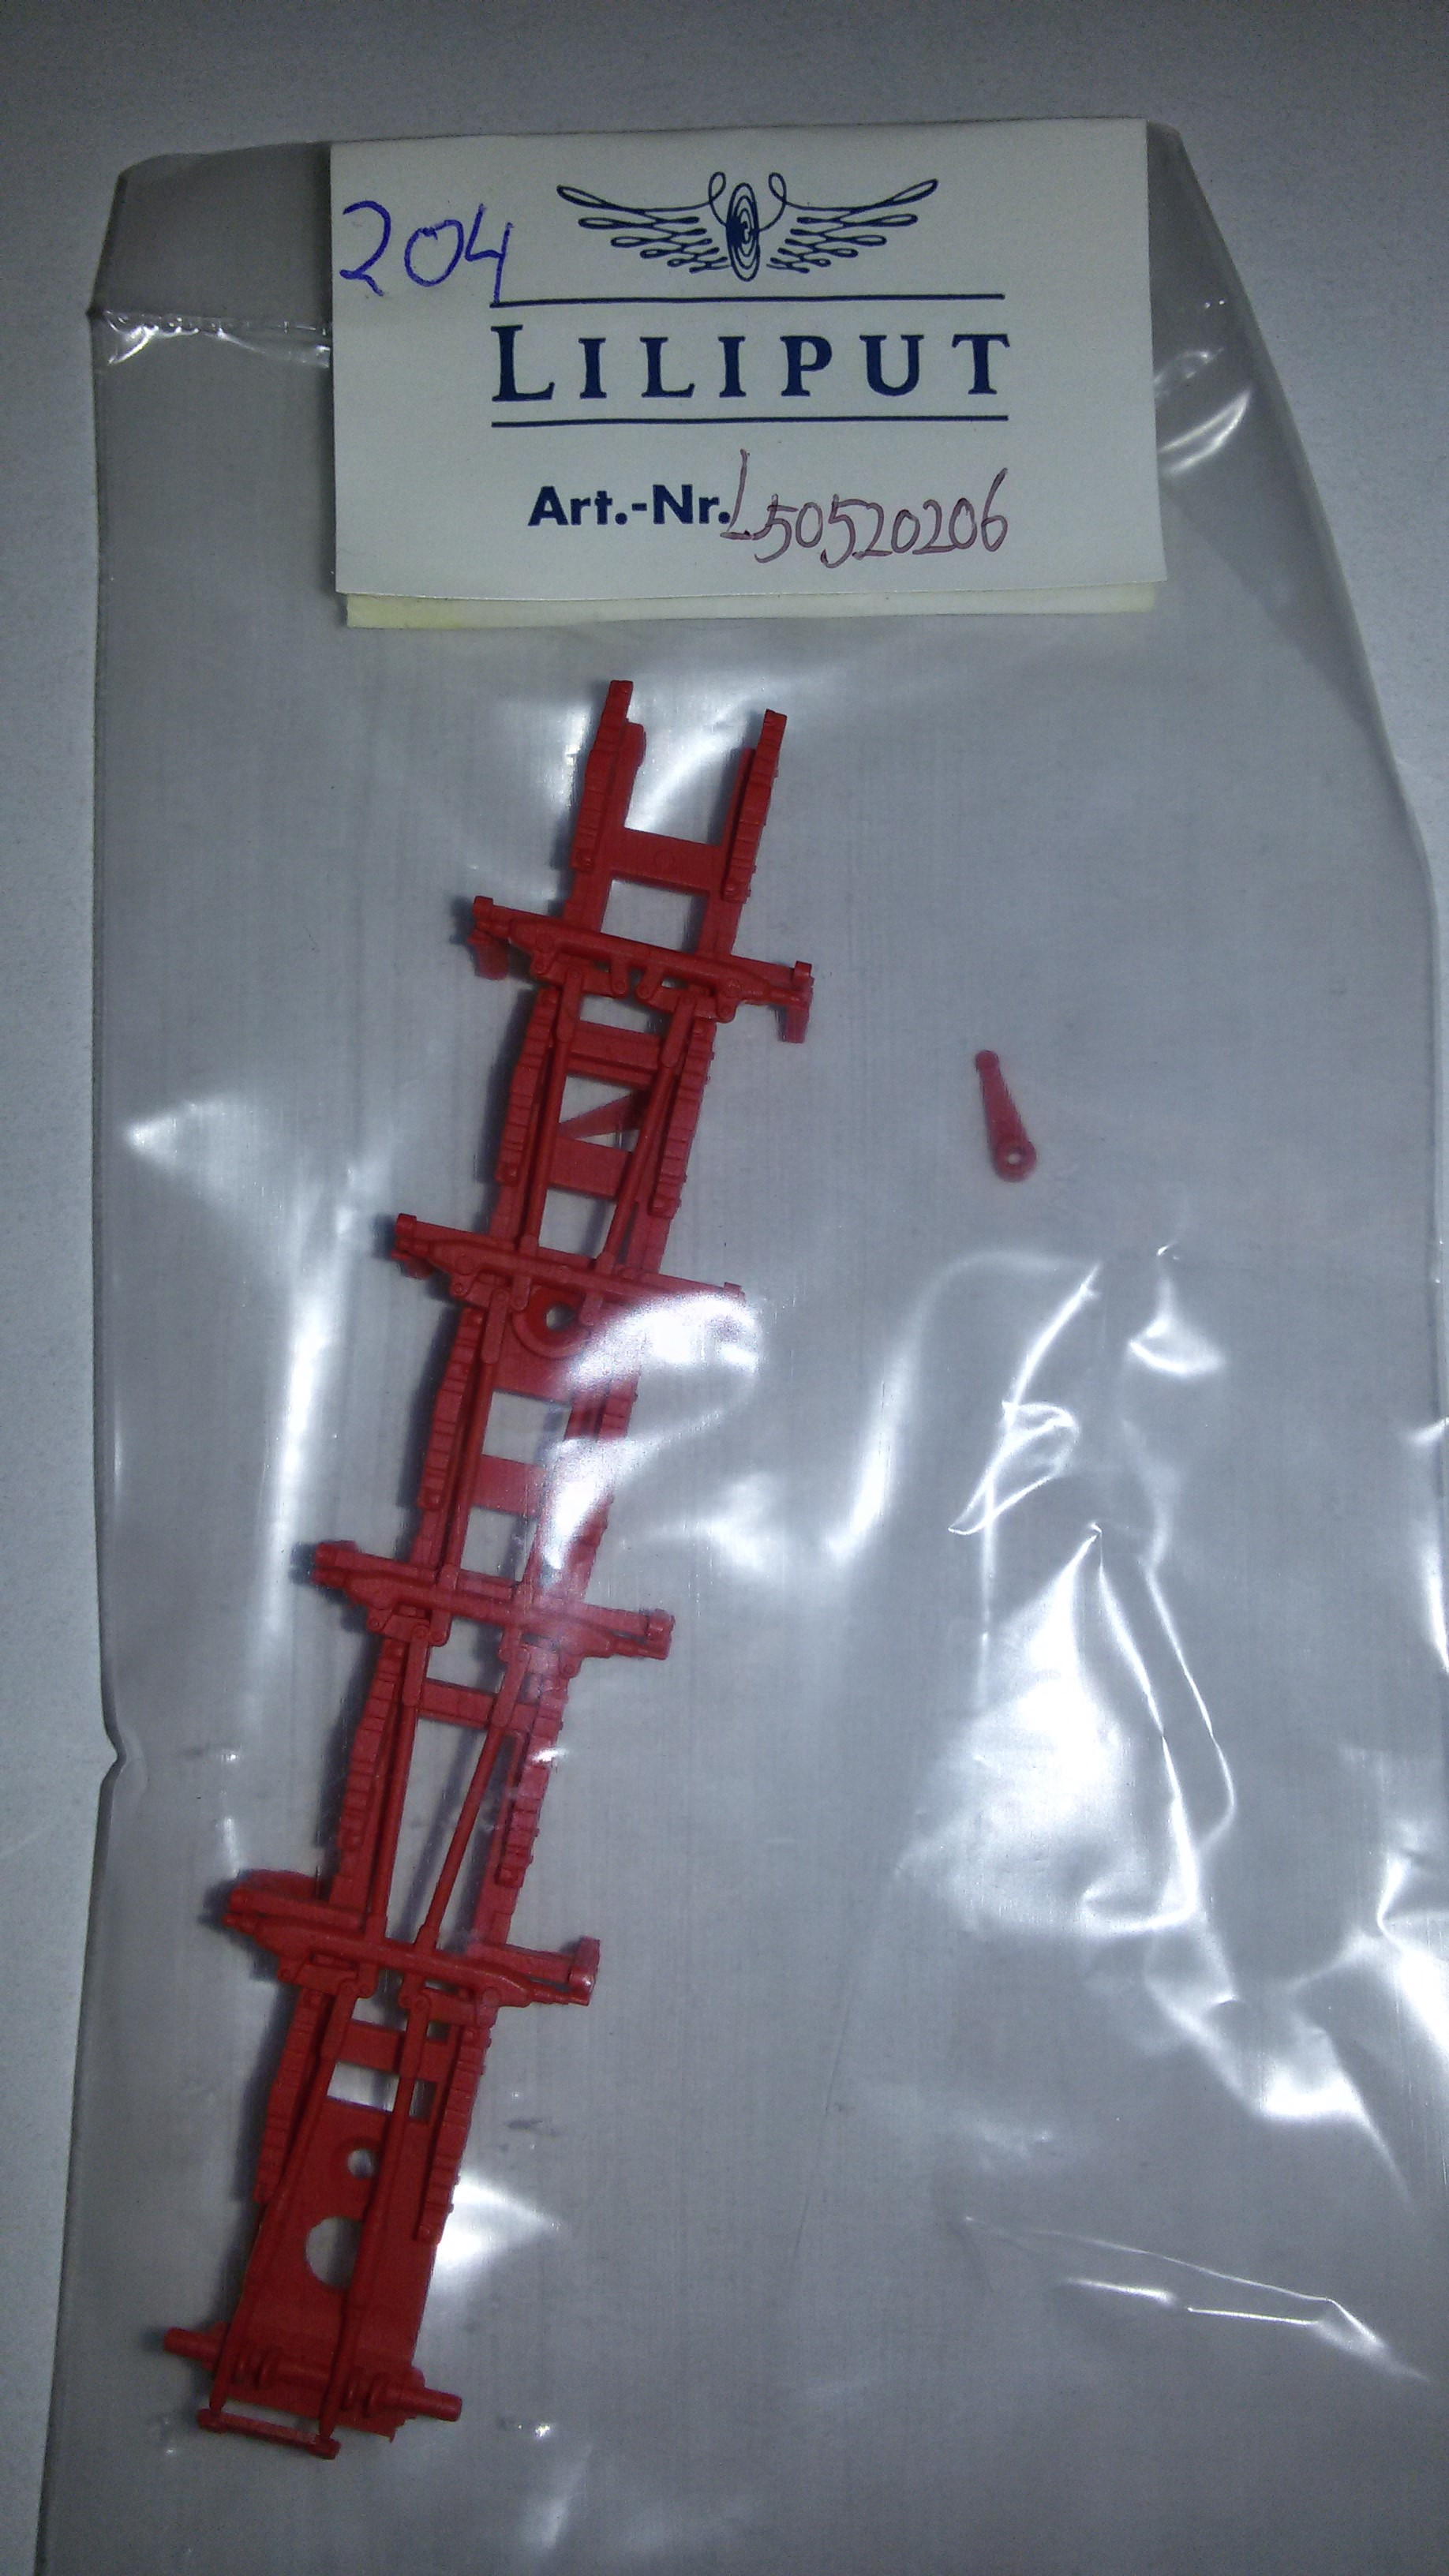 *LO 204* Liliput Ersatzteil L50520206 Rahmenblende